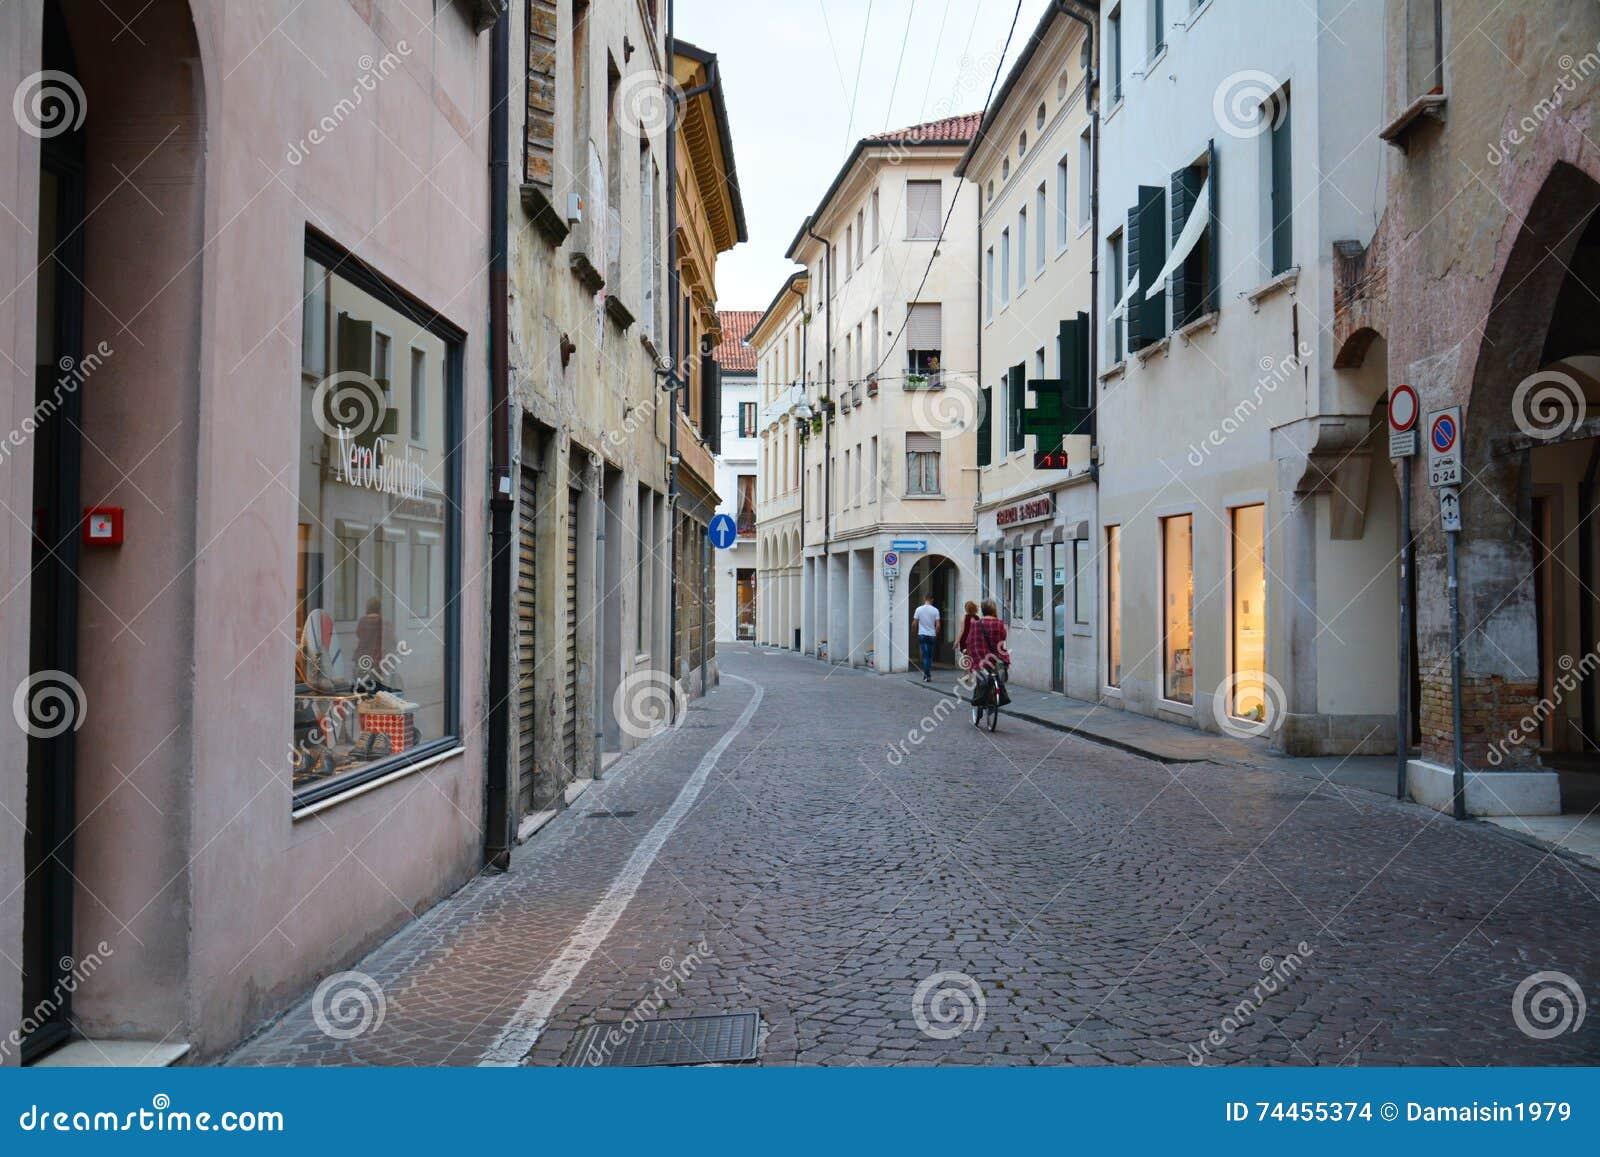 Rues dans mirano italie image stock ditorial image du for Dans italien